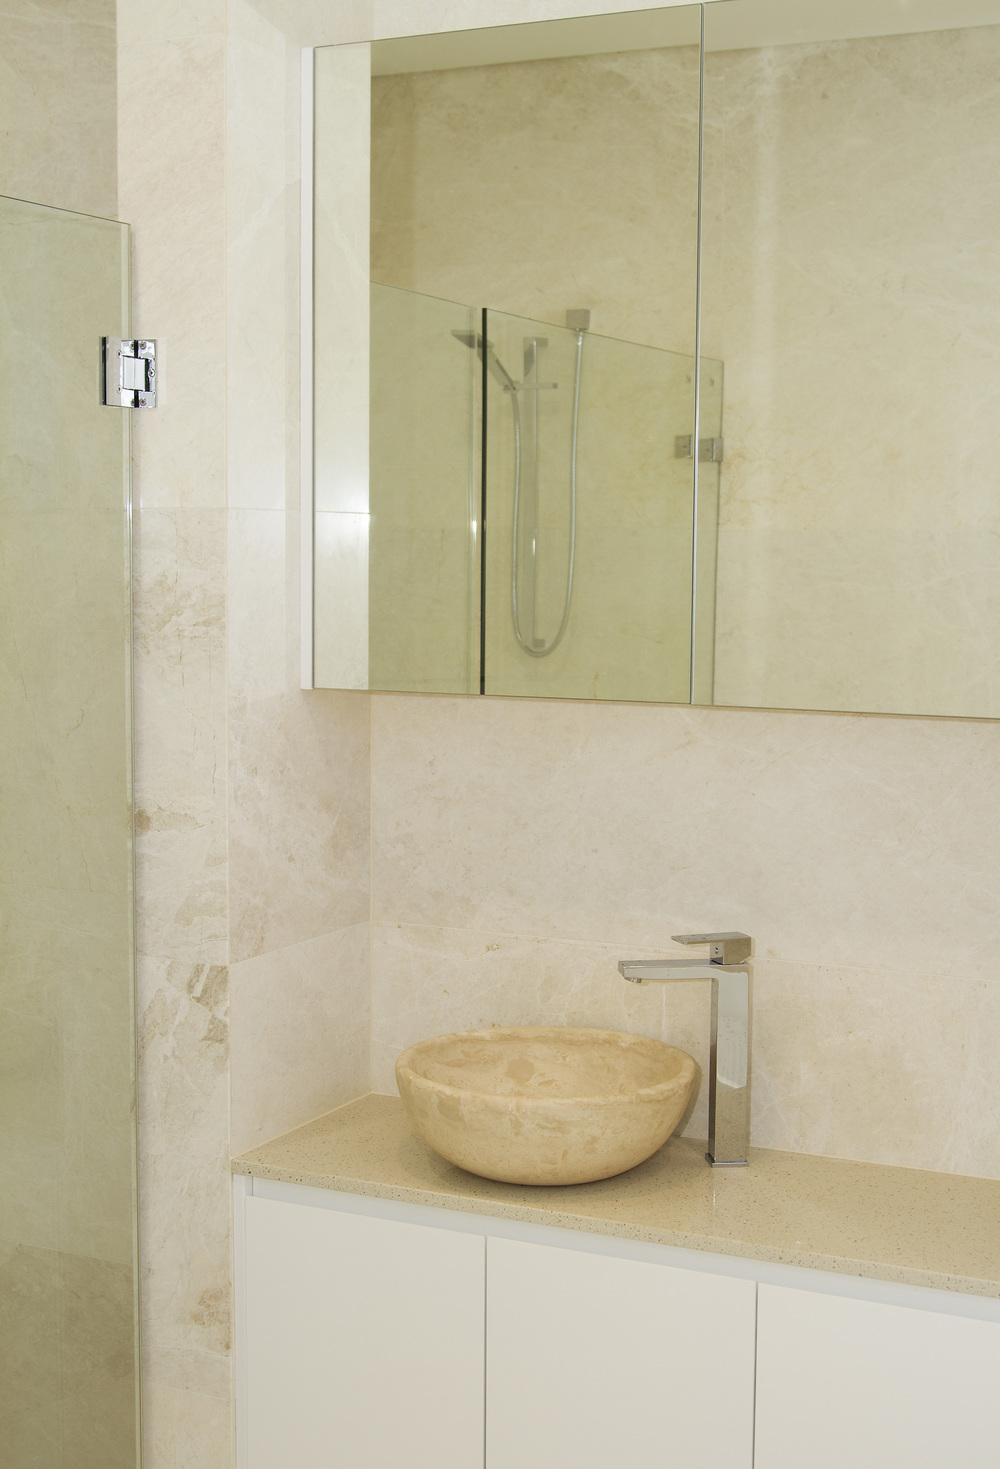 Bathroom Tiles Inspiration Gallery   Marblous Group